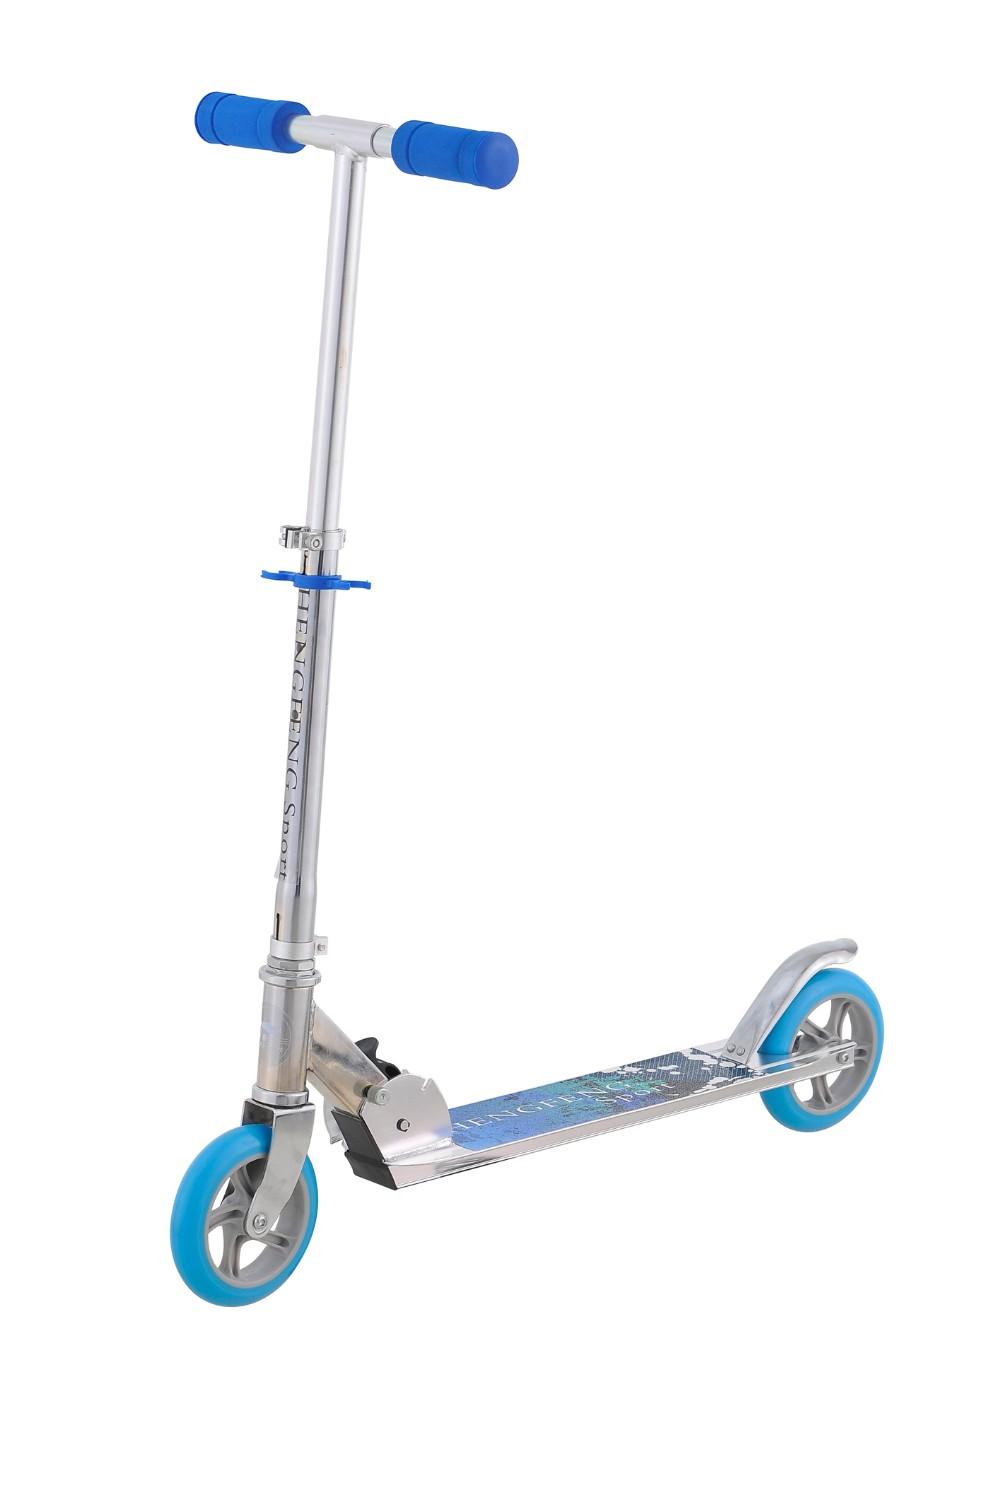 new children kids kick foot scooter 2 wheel foot pro. Black Bedroom Furniture Sets. Home Design Ideas